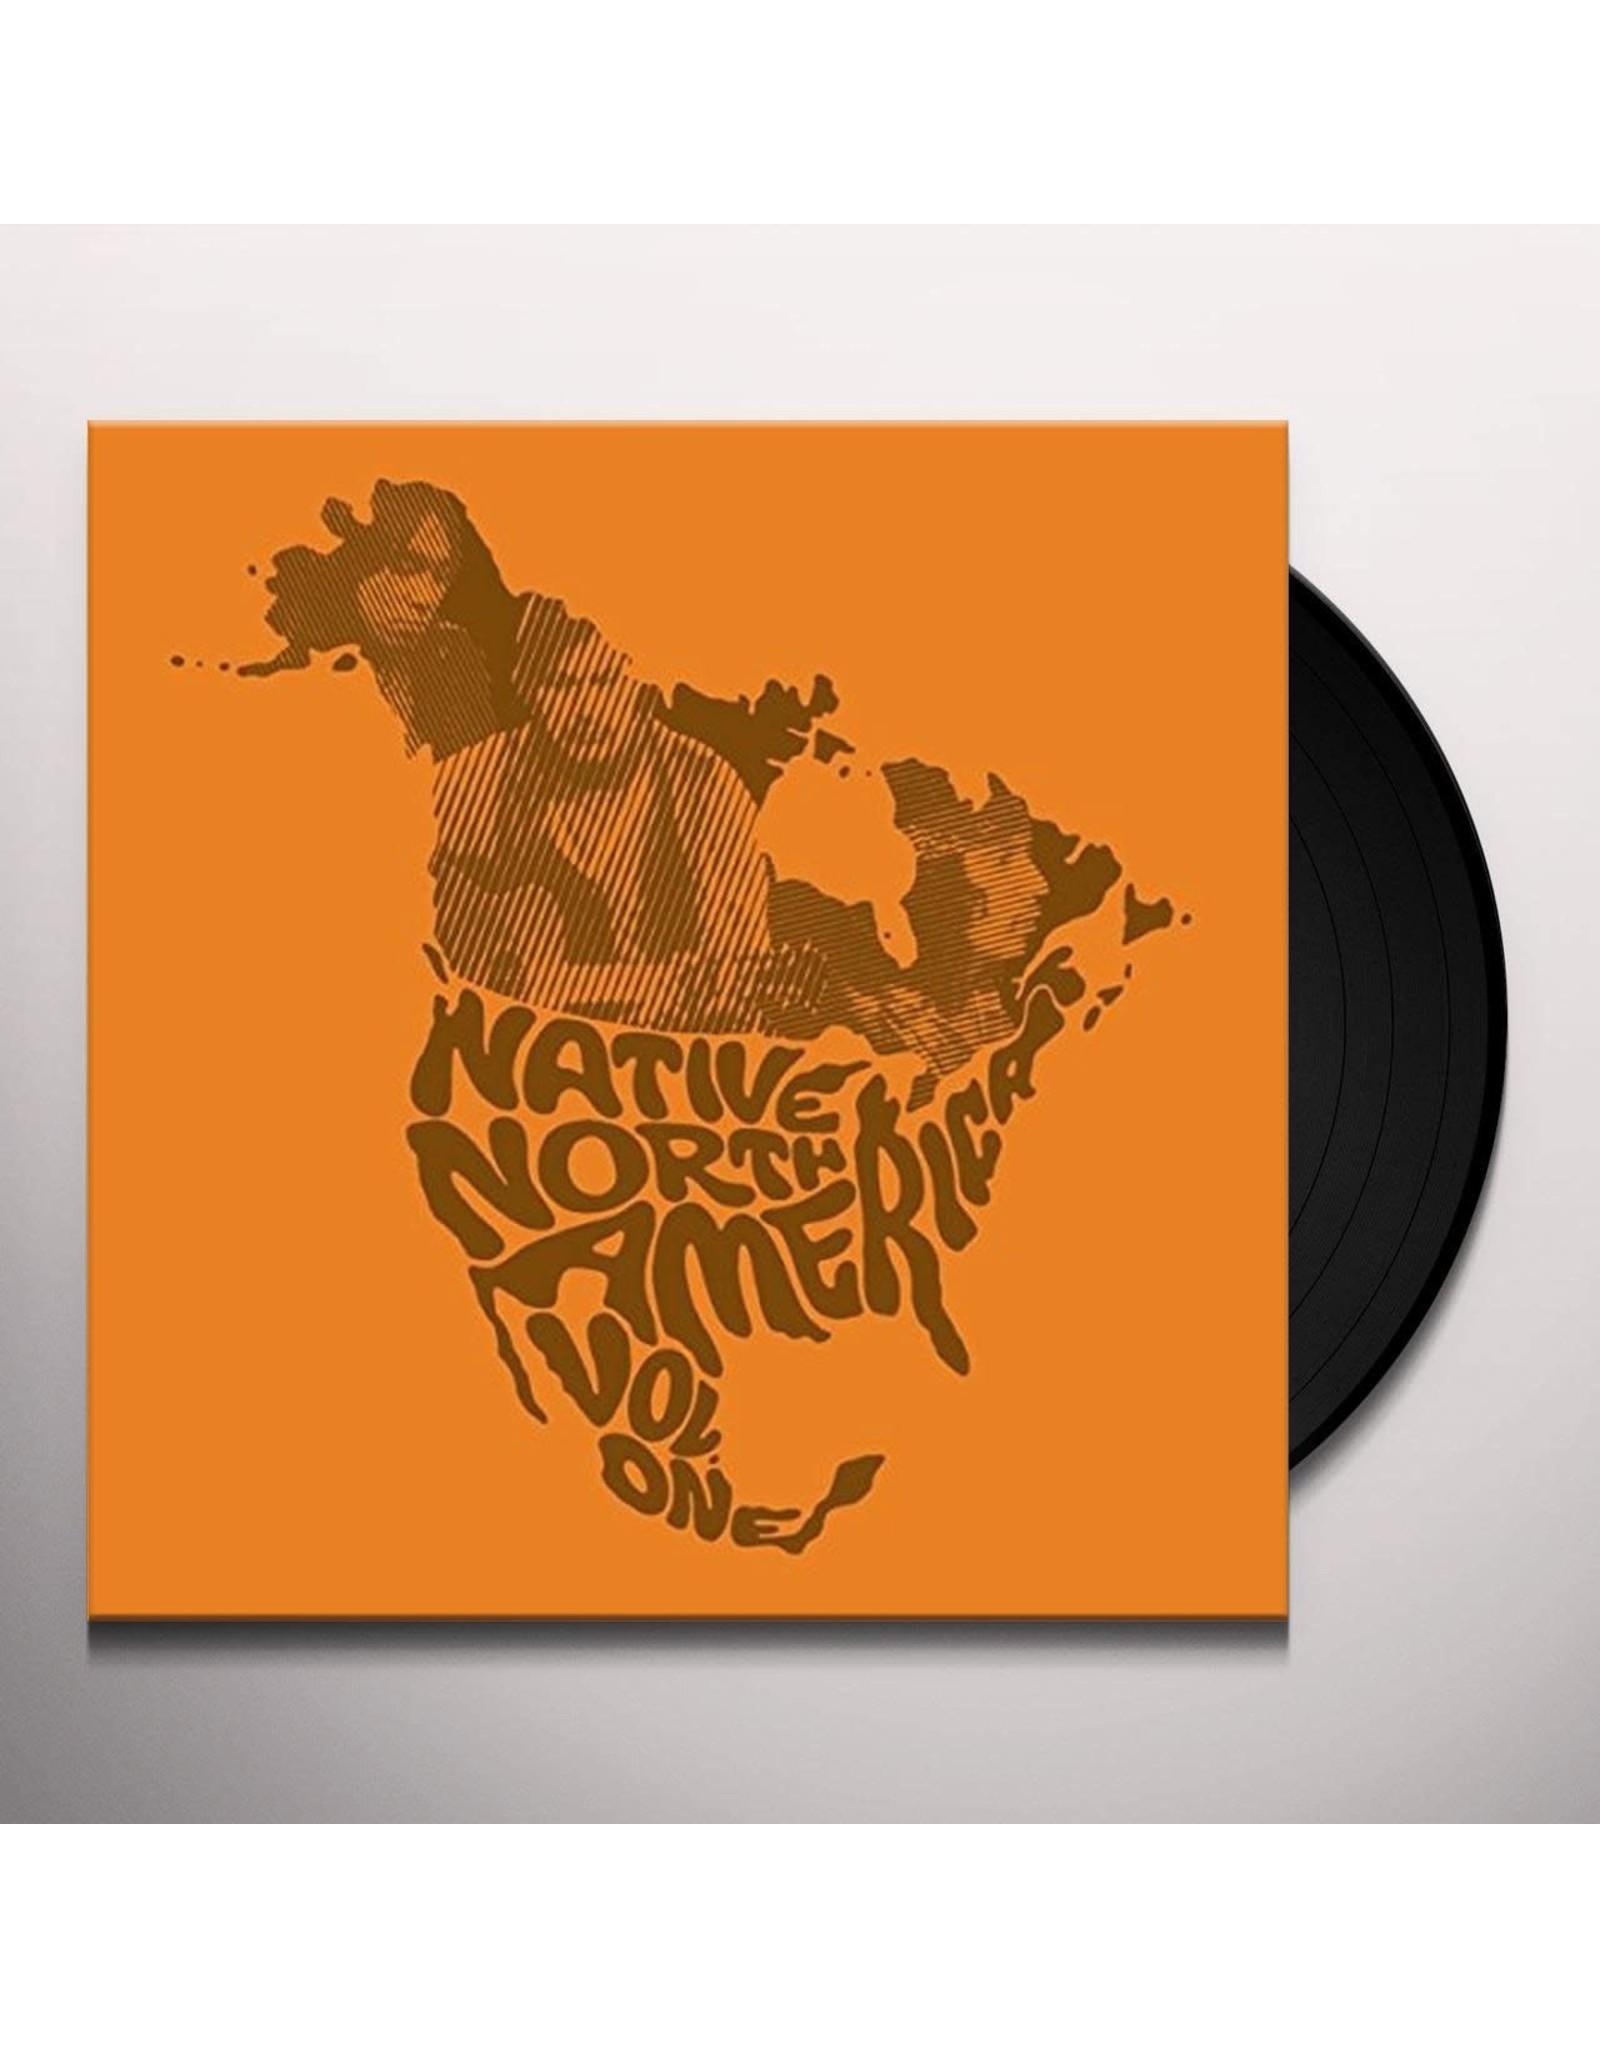 Native North America Volume 1 - Aboriginal, Folk, Rock and Country LP (3LP Boxset with Book)